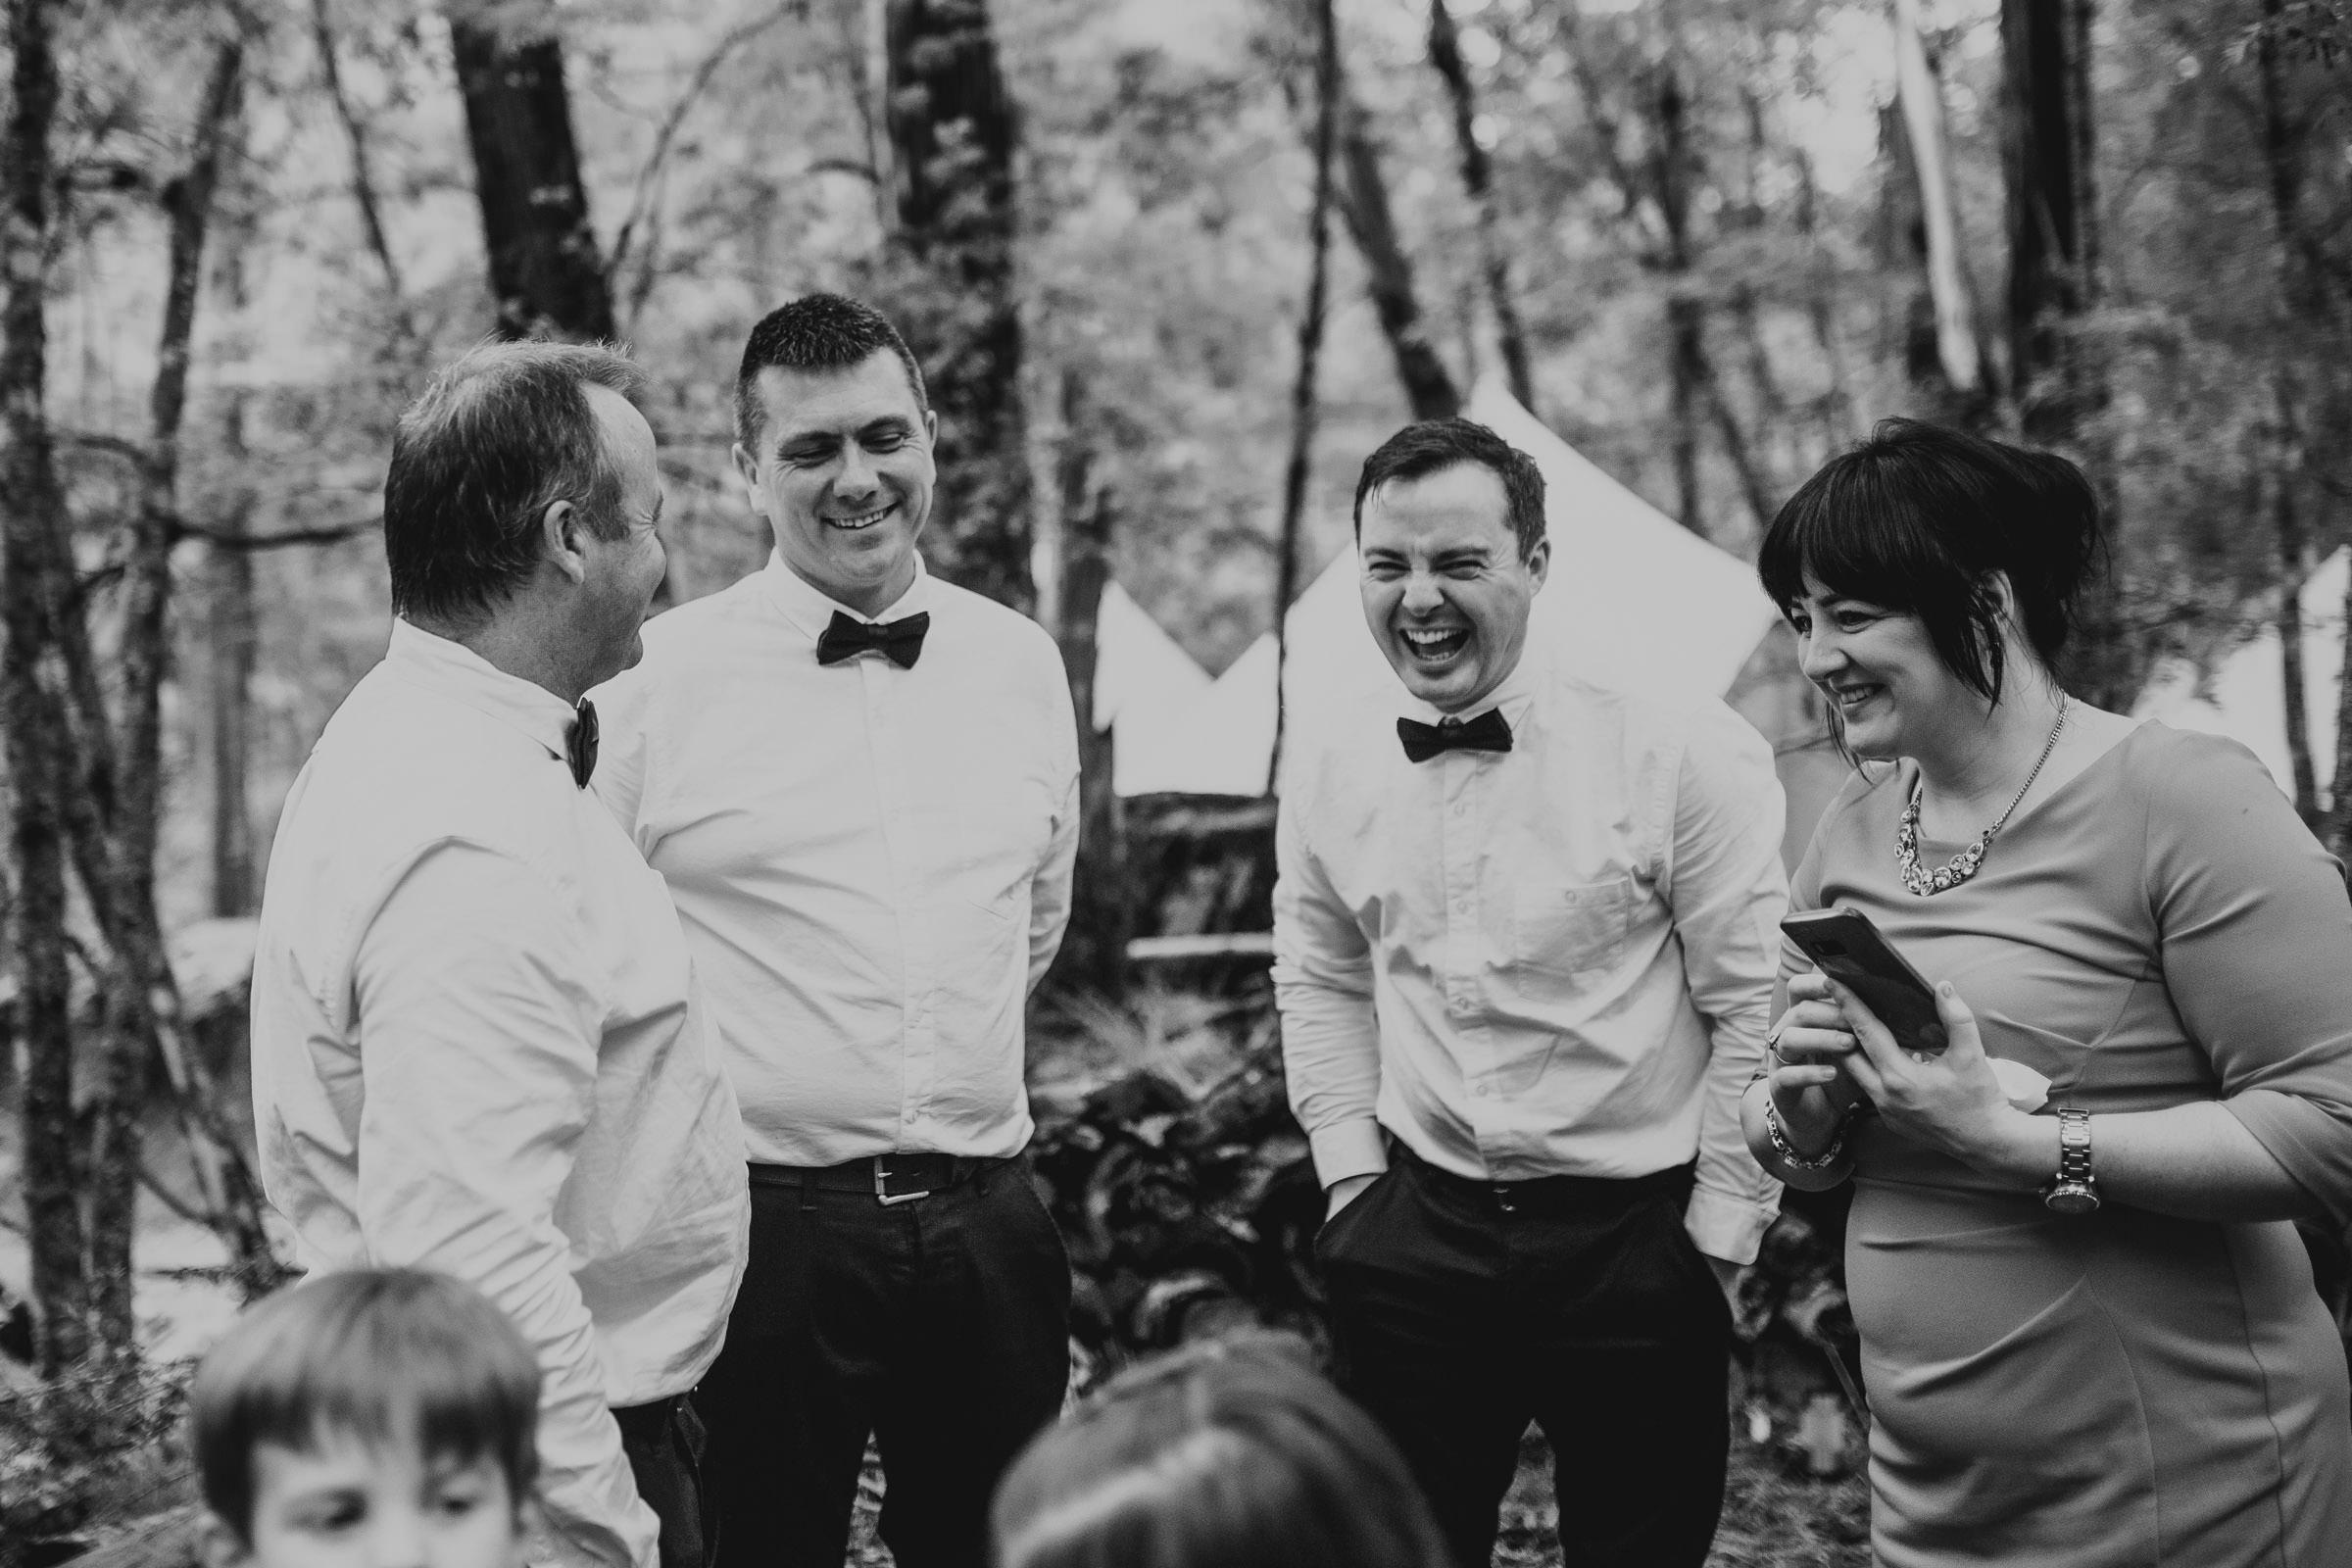 Emma+John+Far+South+Coast+Wedding+Festivl+Glamping+Bush-108.jpg